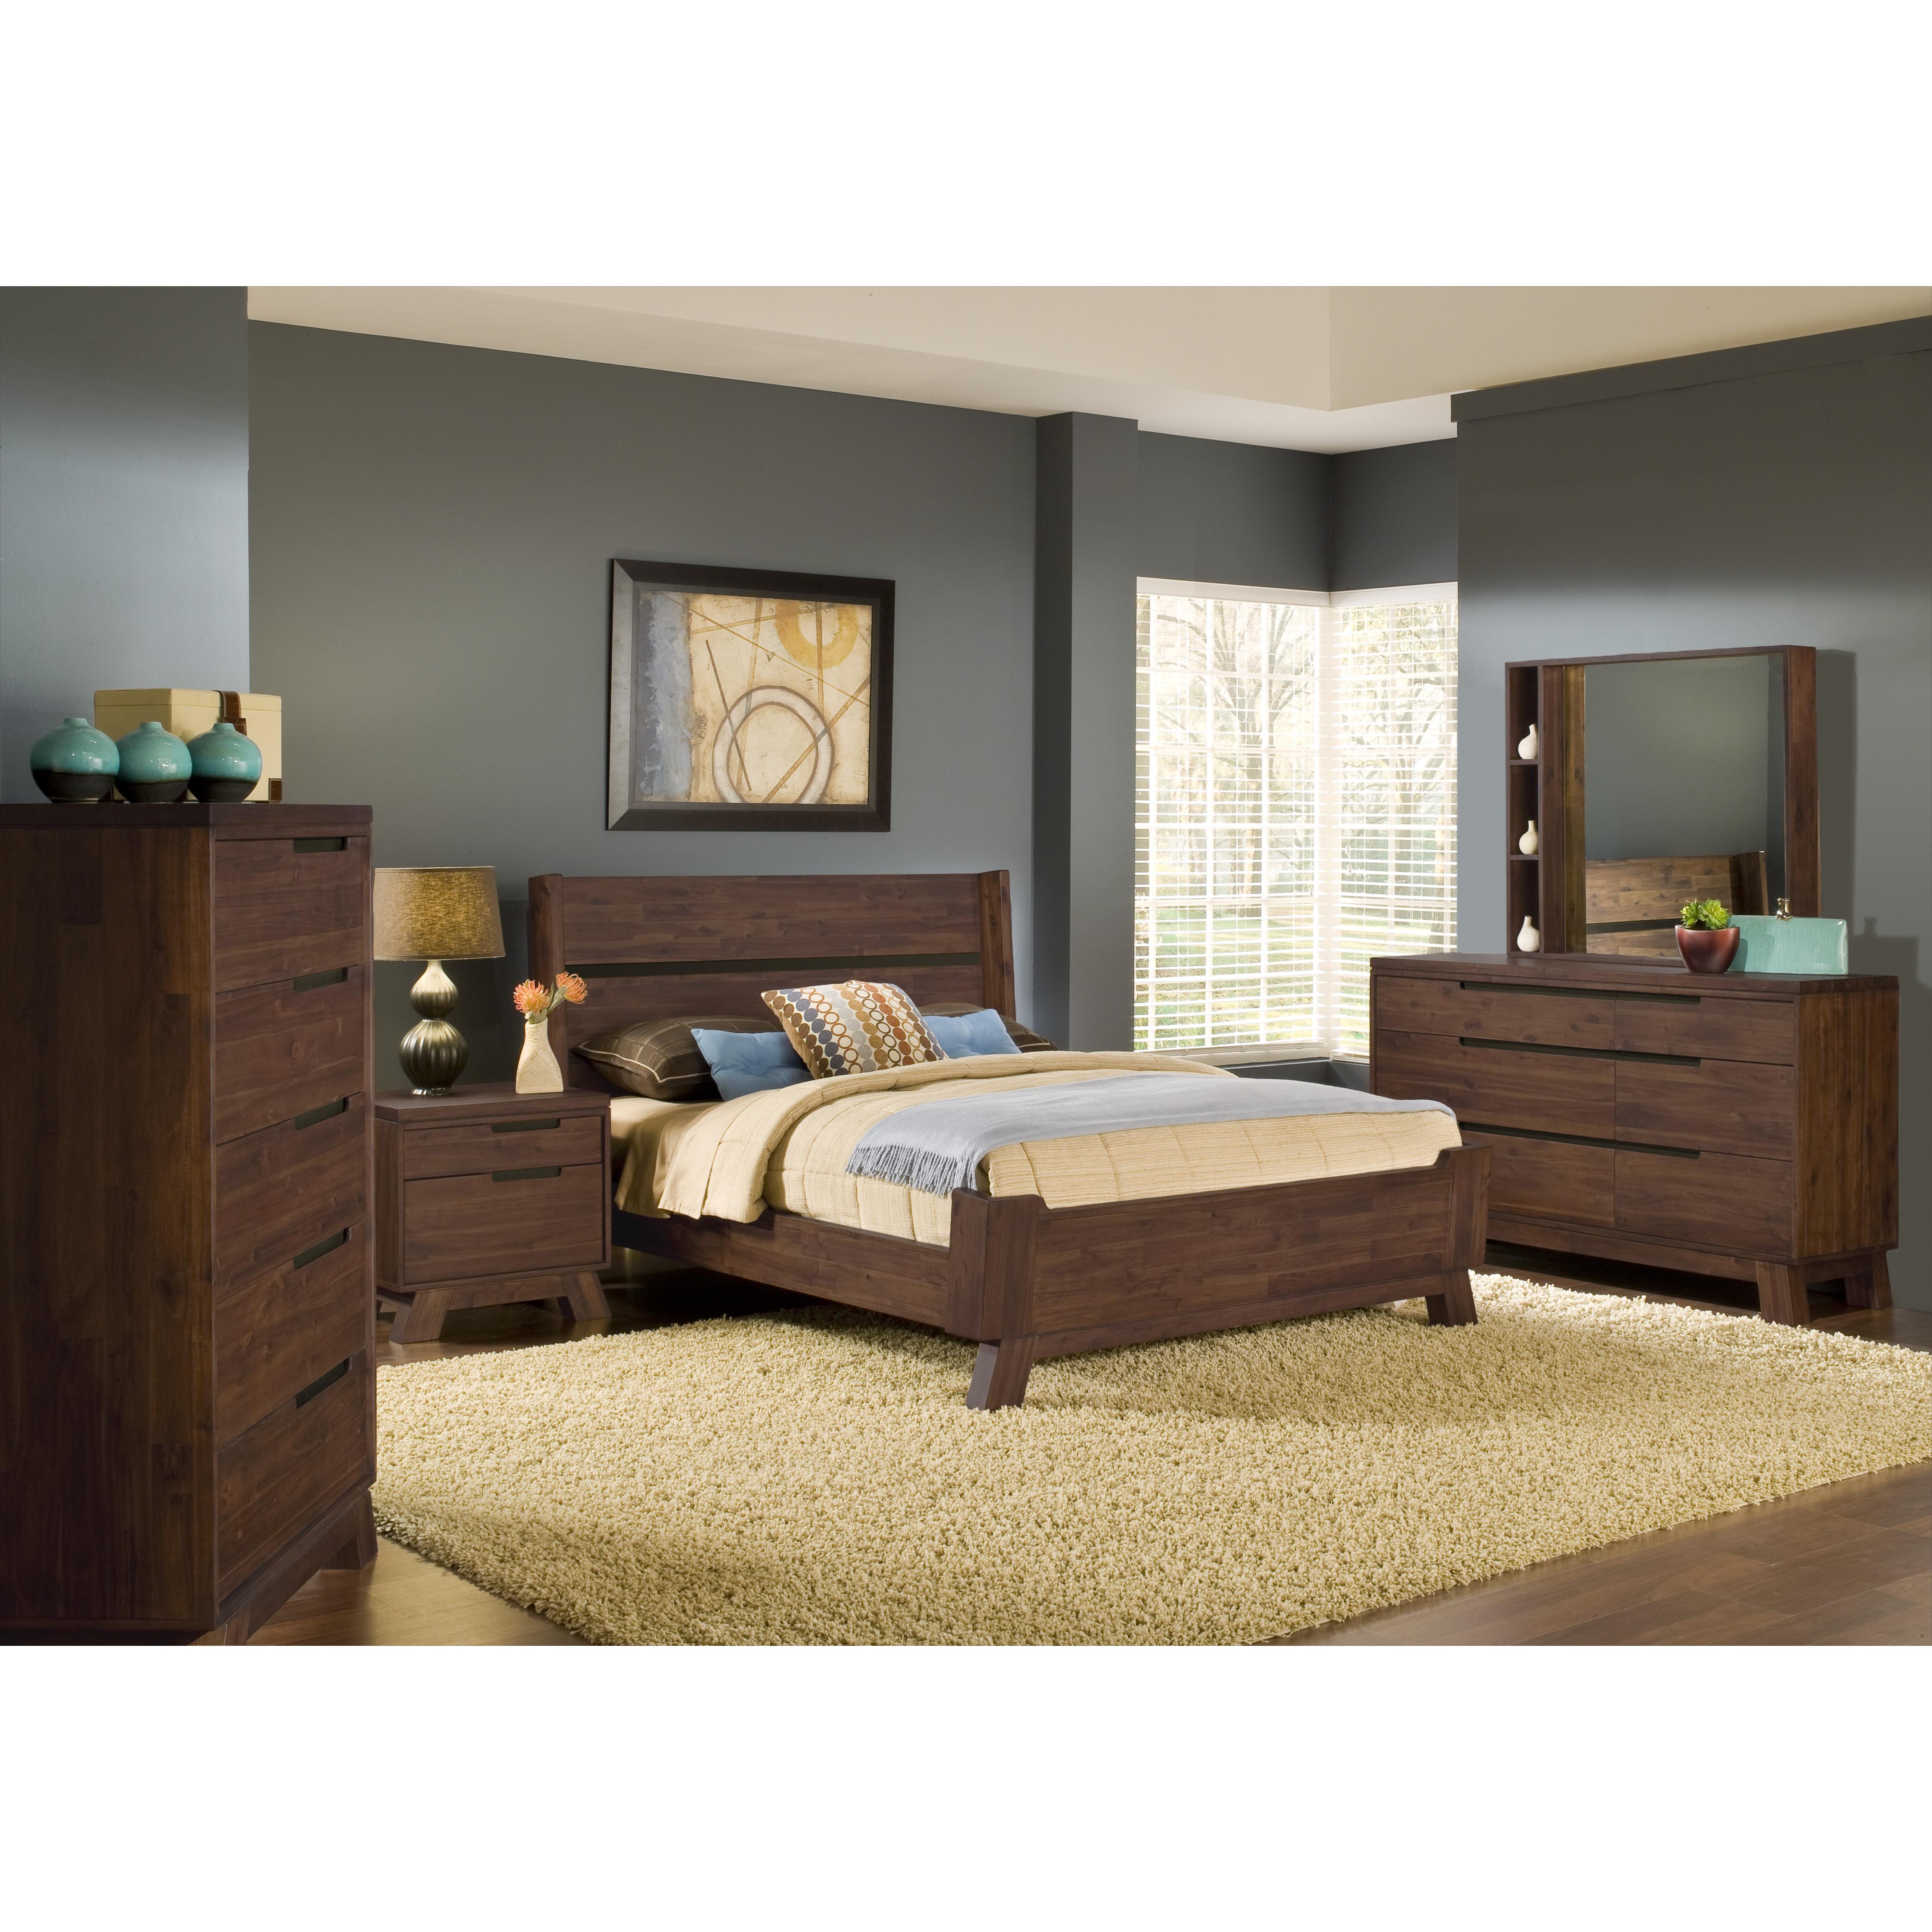 Modus portland bedroom collection broadway furniture for Bedroom suite furniture